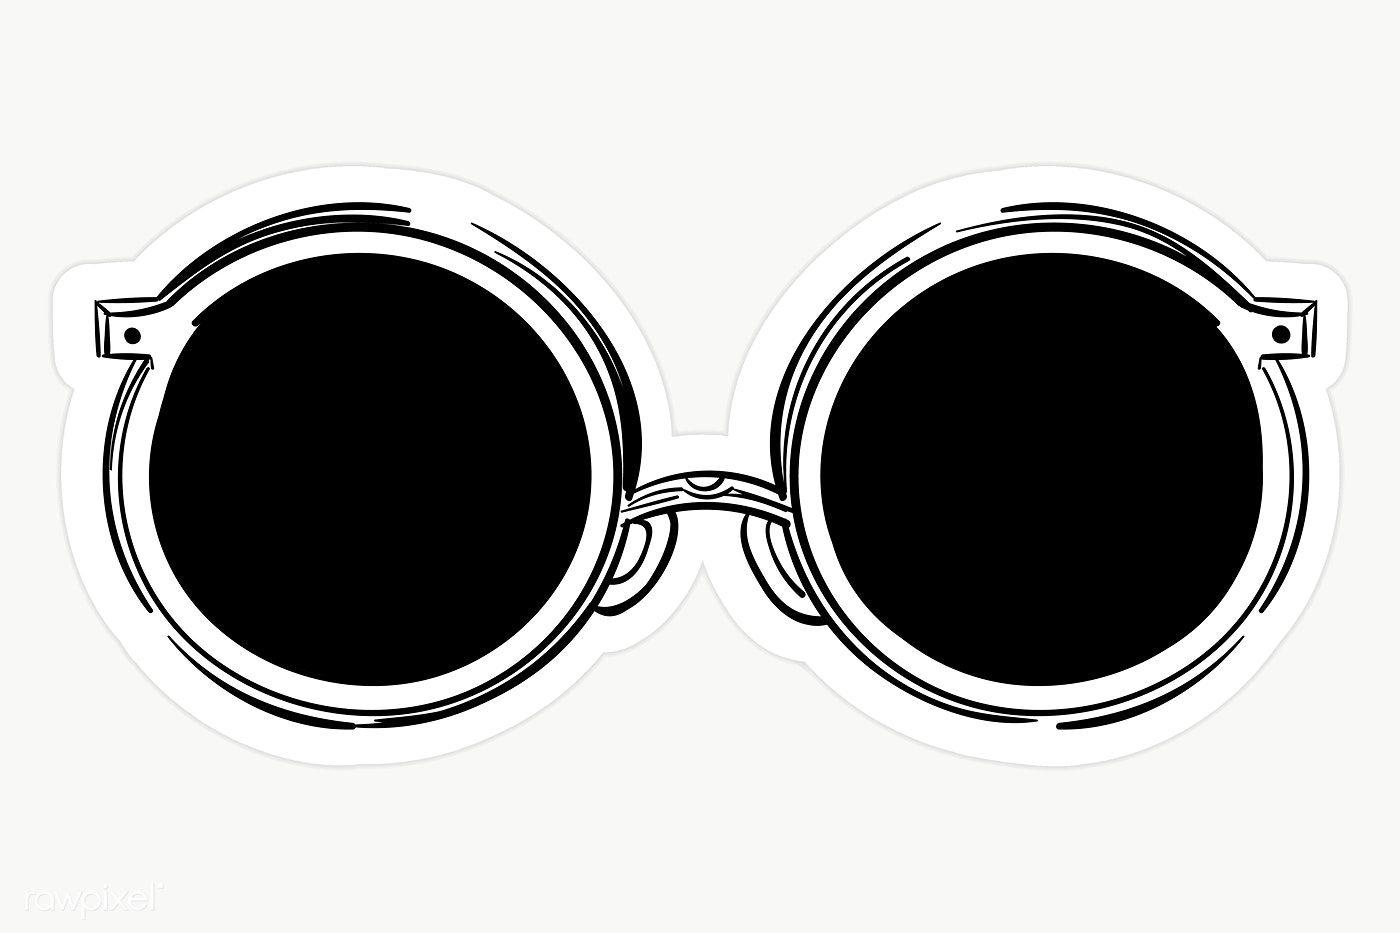 Black Round Vintage Sunglasses Transparent Png Premium Image By Rawpixel Com Sasi Round Sunglasses Vintage Sunglasses Vintage Black And White Stickers